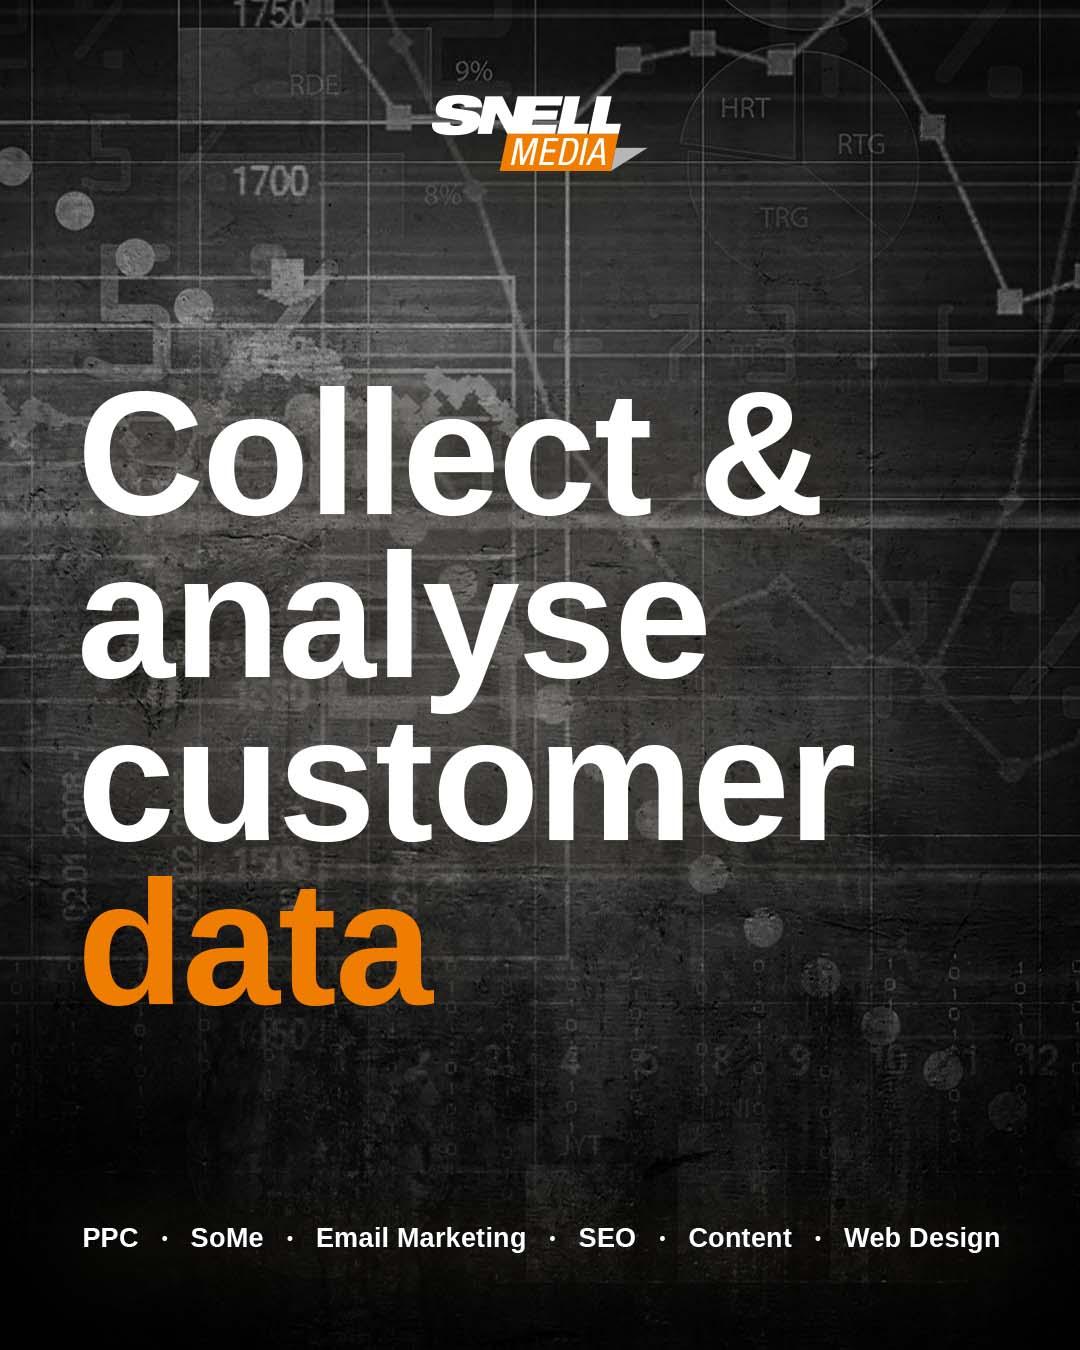 Collect & Analyse Customer Data